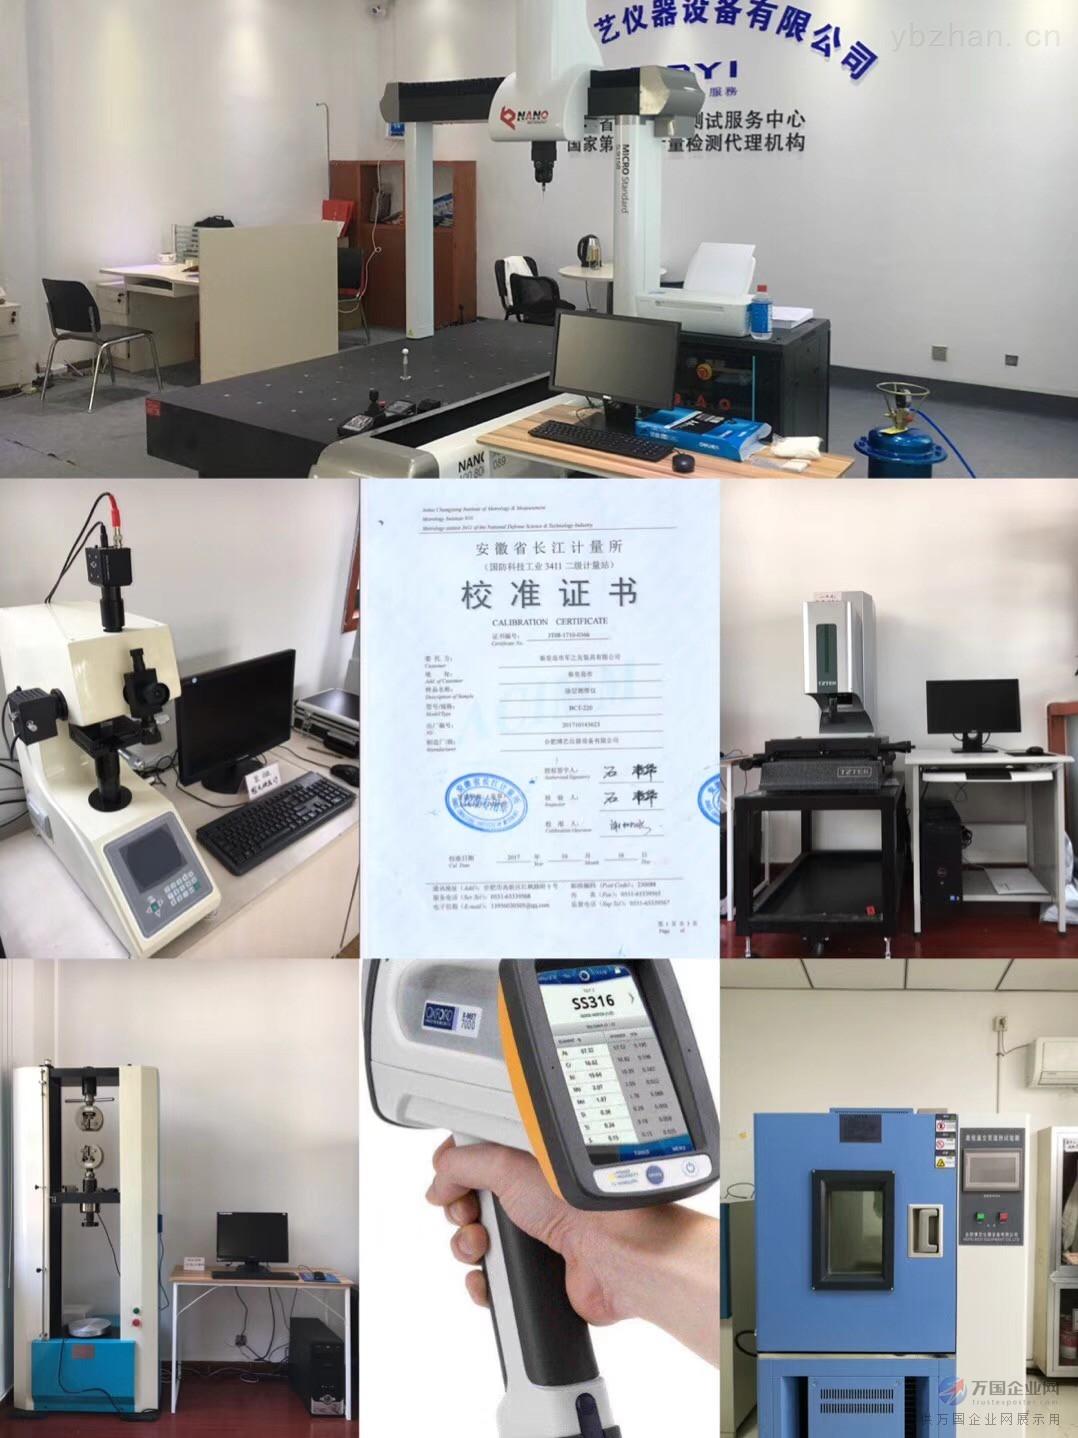 MMD-HPG100F-第三方检测粗糙度轮廓仪仪器